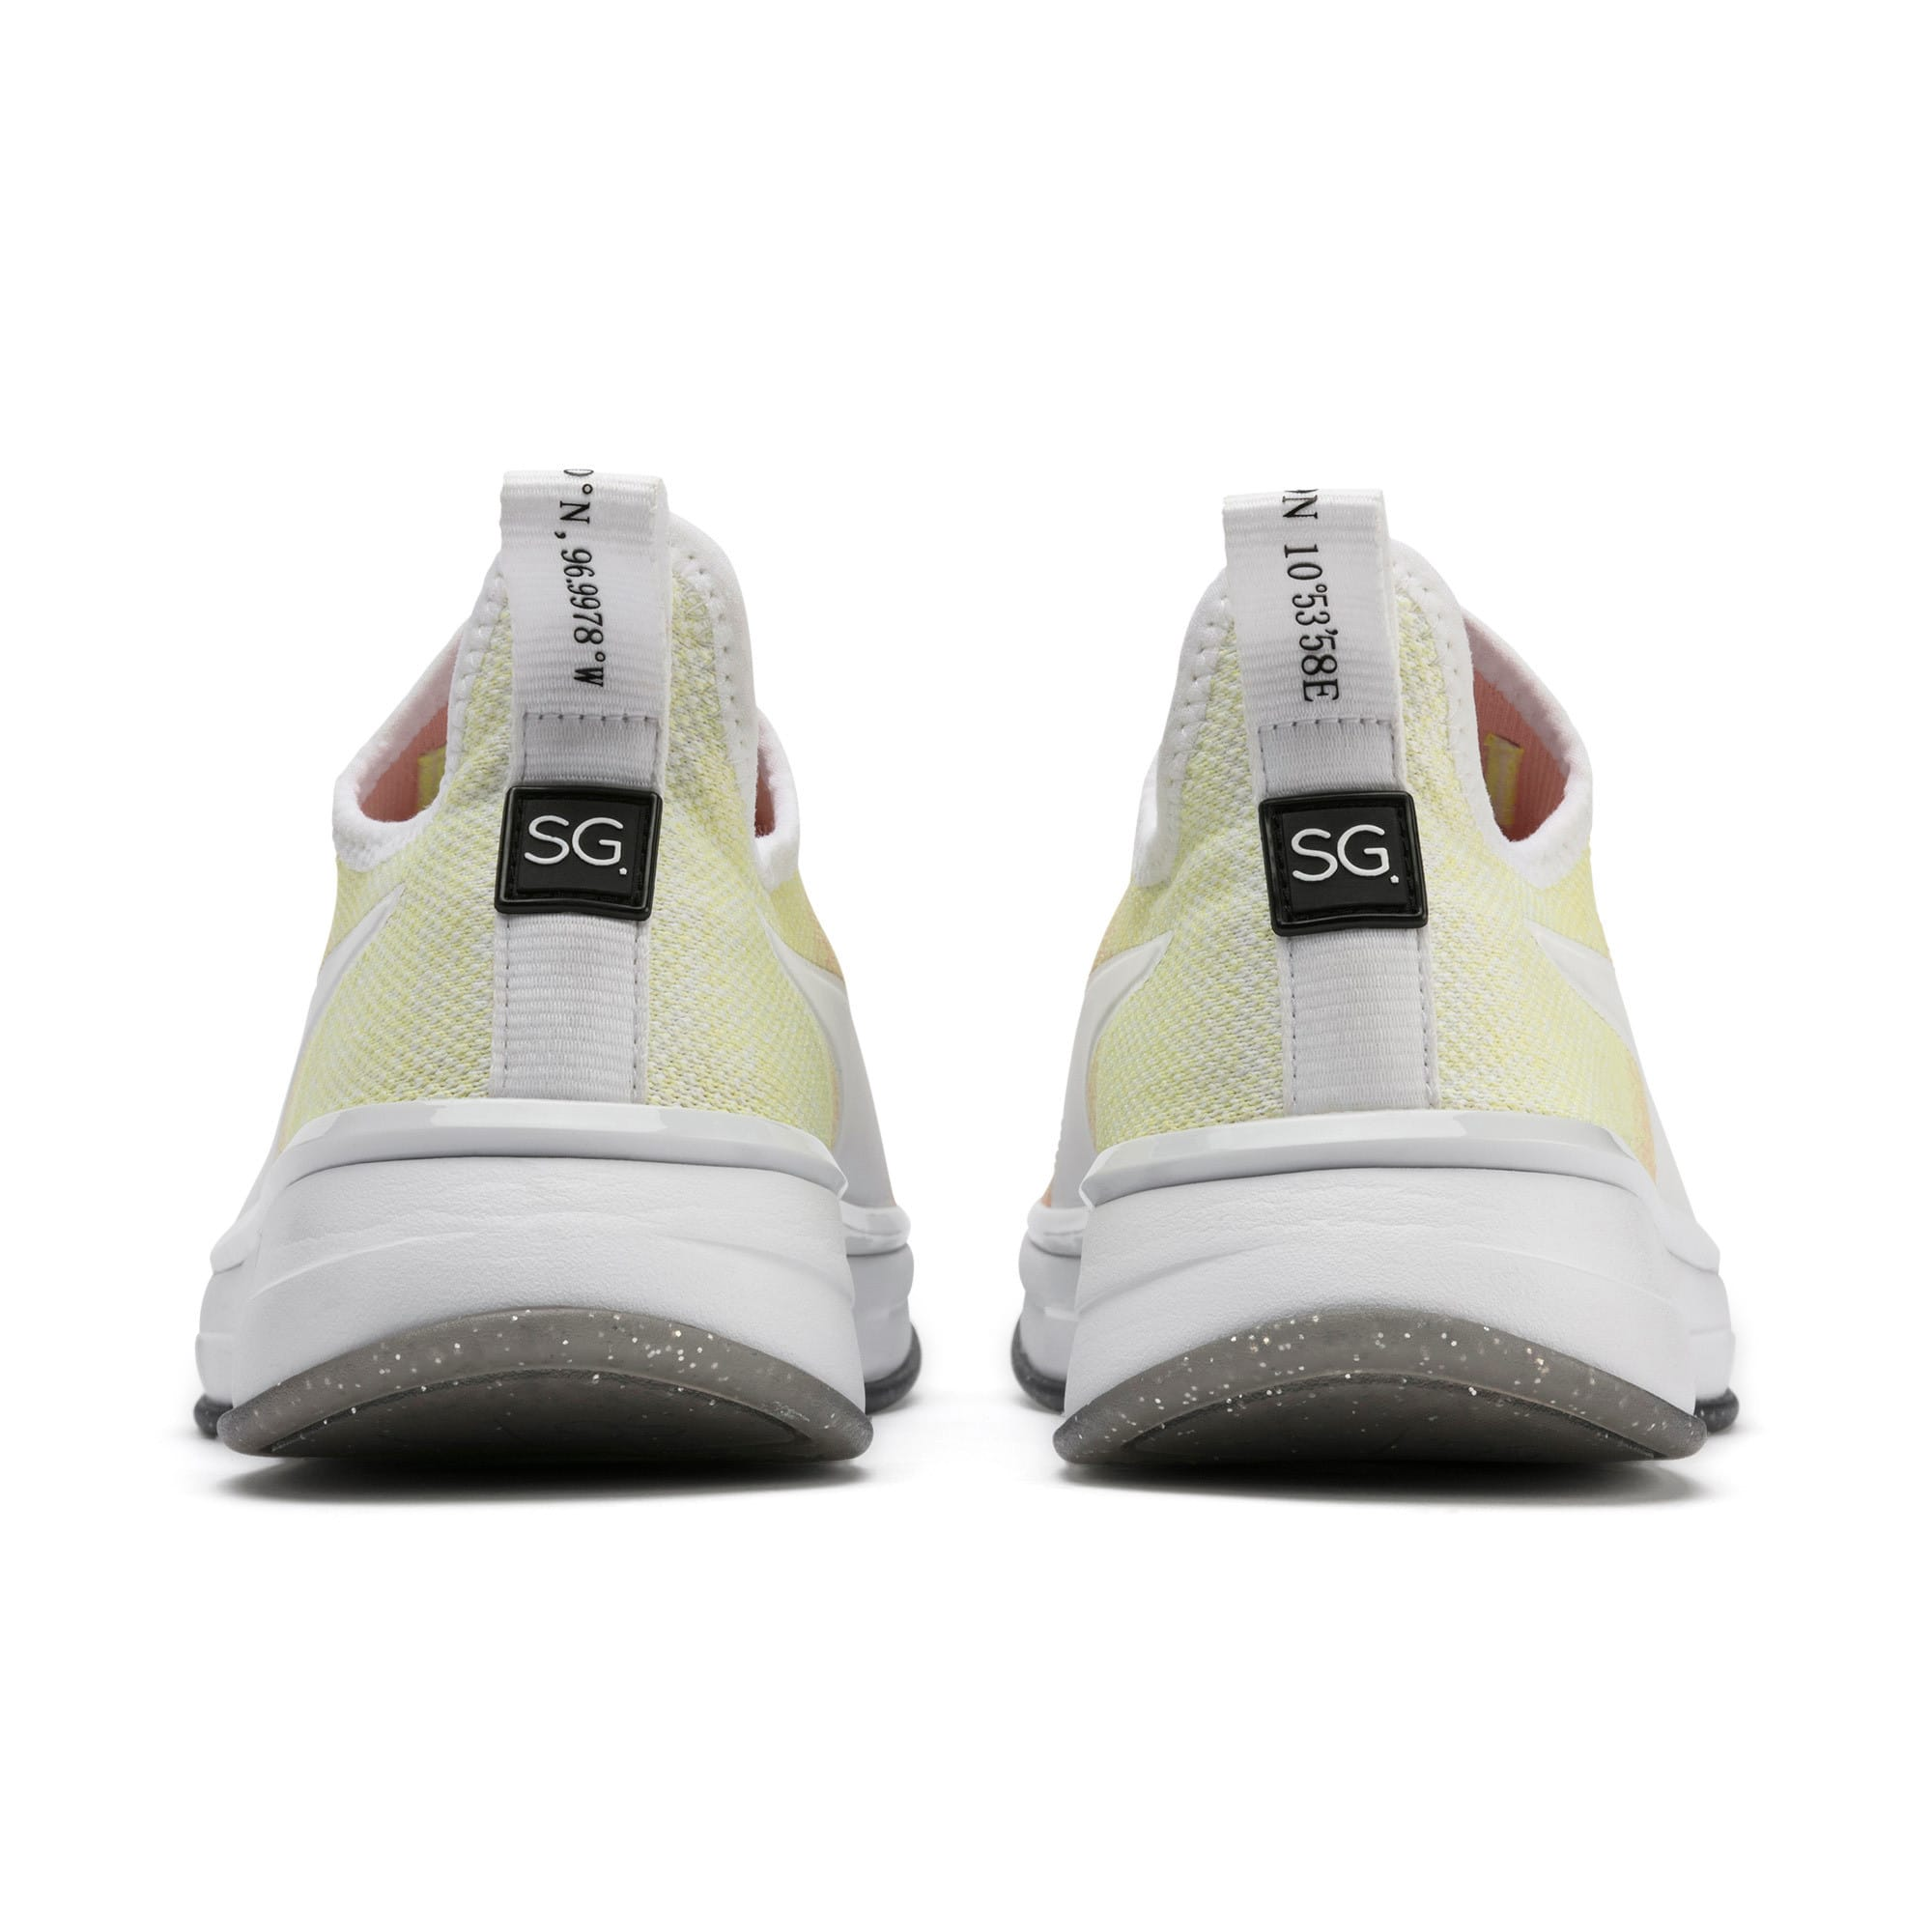 Thumbnail 4 of SG Slip-On Sunrise Women's Training Shoes, YELLOW-Peach Bud-White, medium